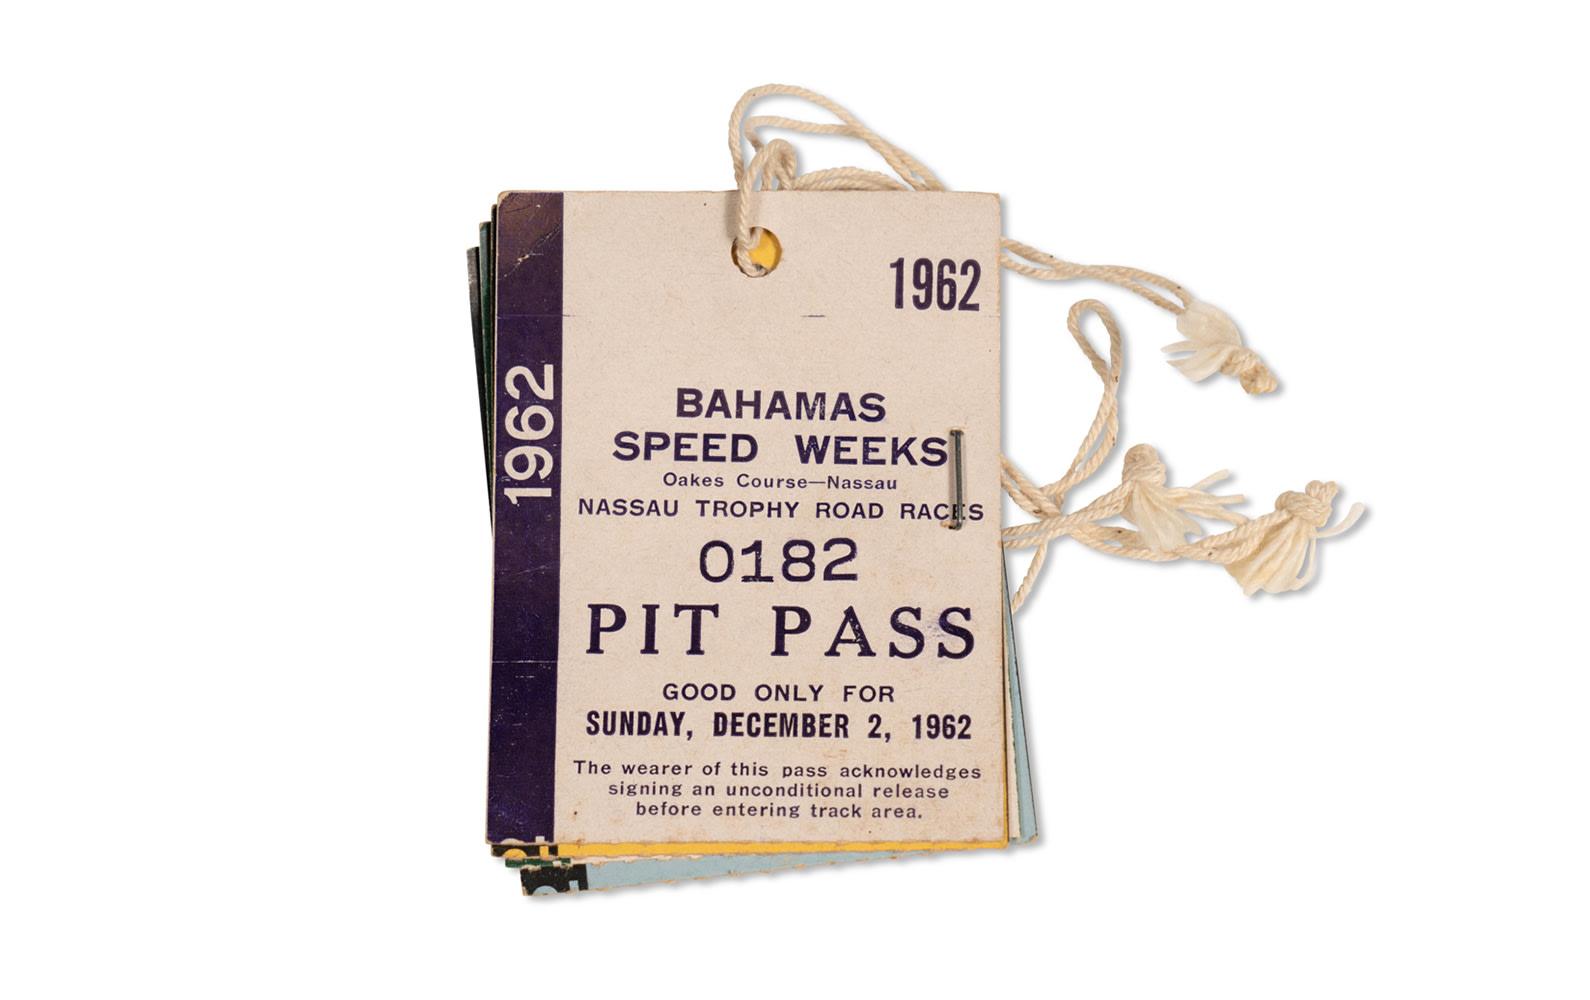 1962 Bahamas Speed Weeks Pit Passes